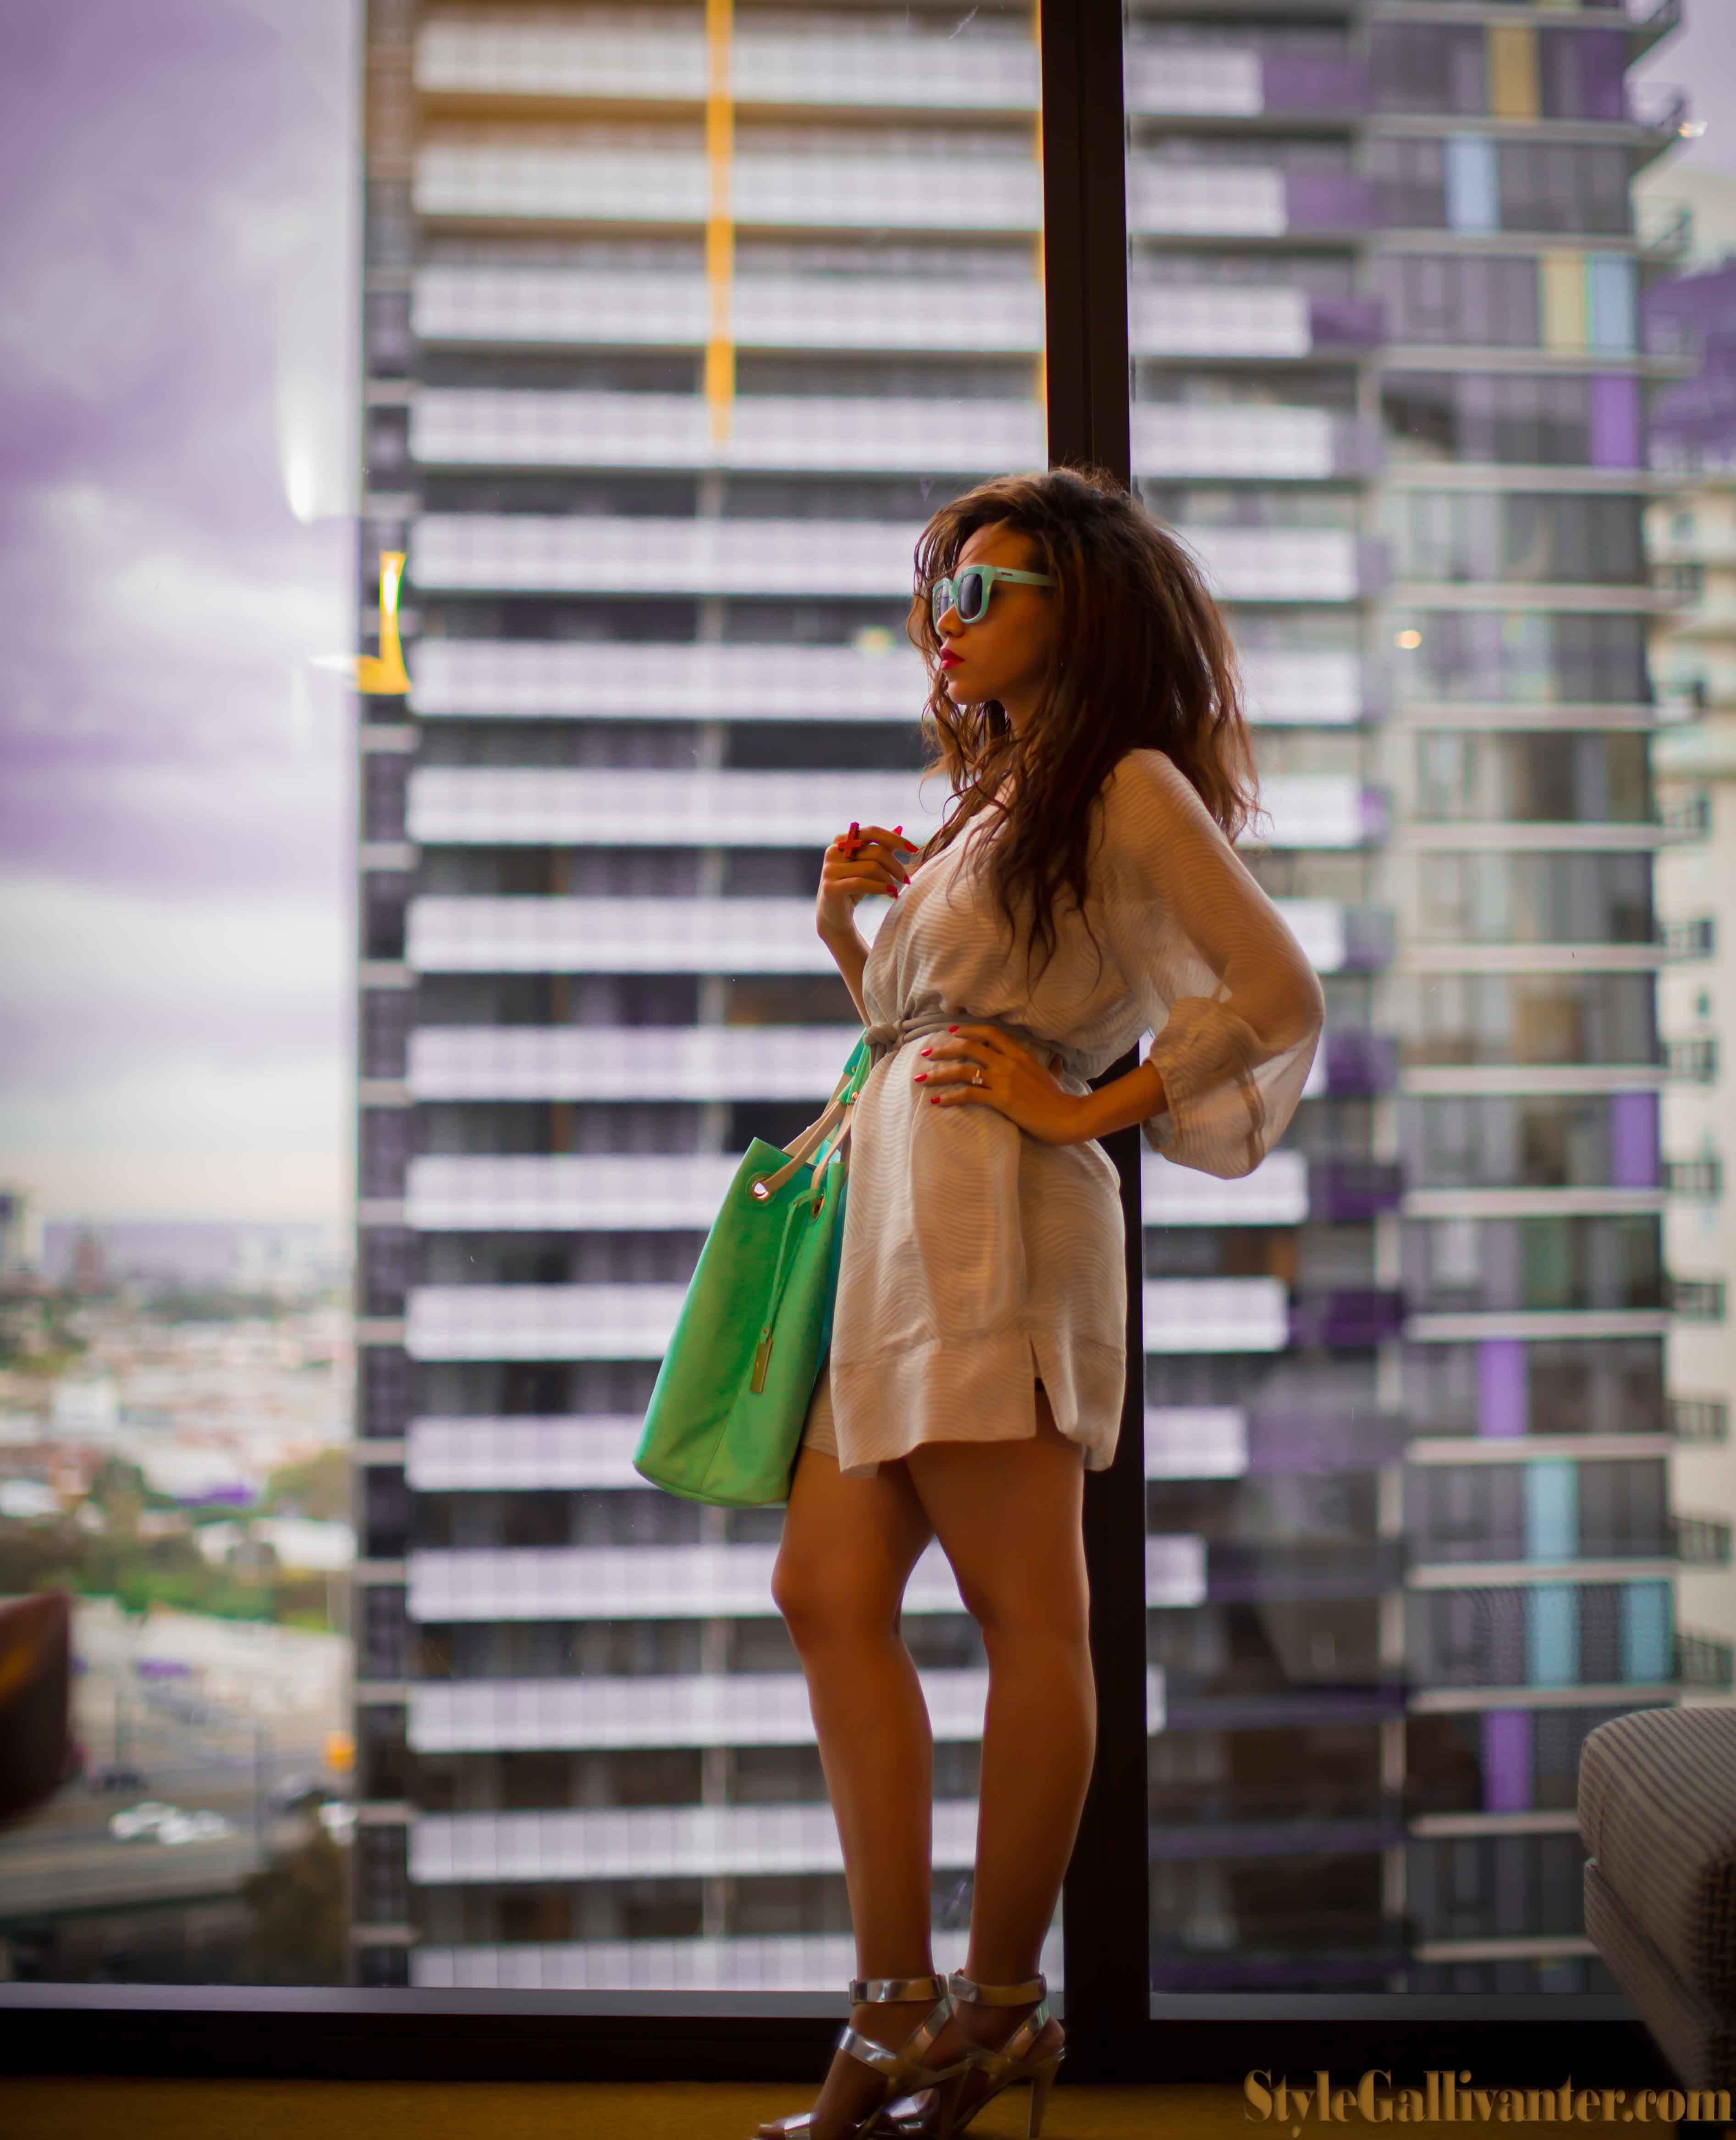 classy-elegant-bloggers_womenswear-trends-2014_sheer-armani-dress_best-freelance-stylists-melbourne_best-personal-stylist-melbourne_best-image-consultant-melbourne_best-editorial-stylist_celebrity-stylists-melbourne